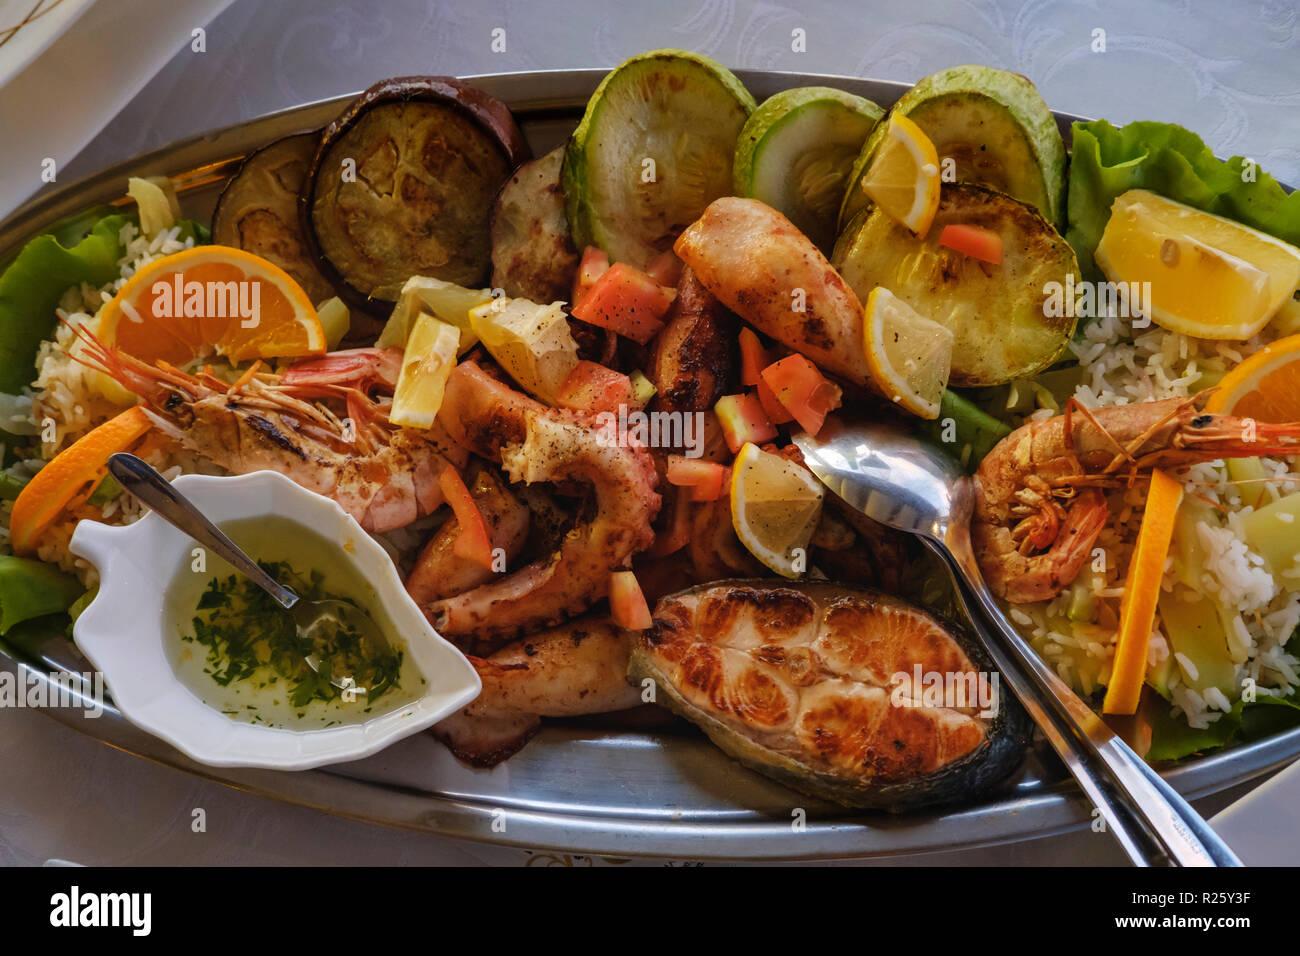 Seafood plate, Krasici, near Tivat, Montenegro Stock Photo